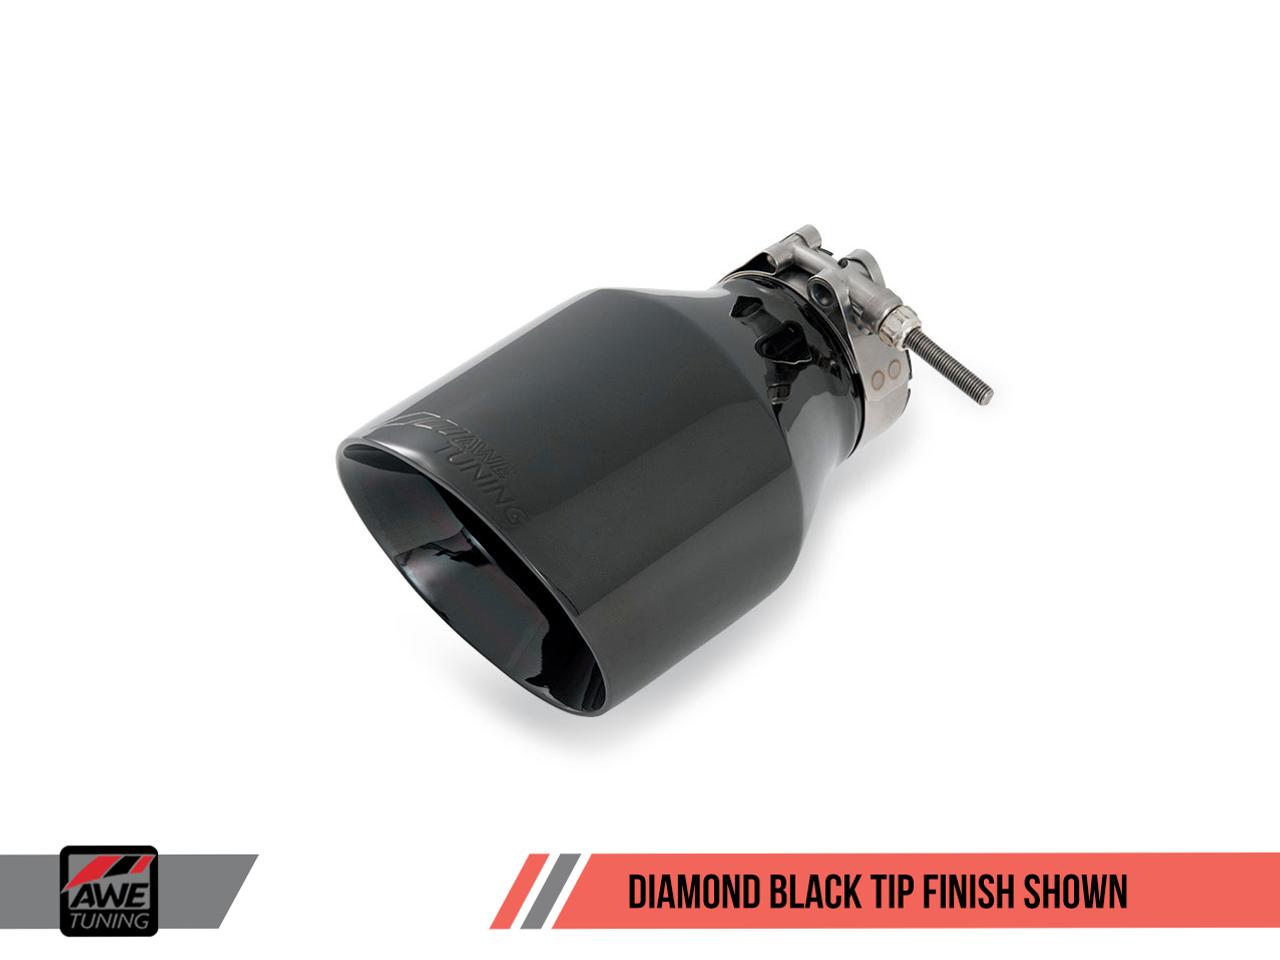 AWE Tuning Jetta Mk5 2.0T Track Edition Exhaust - Diamond Black Tailpipe